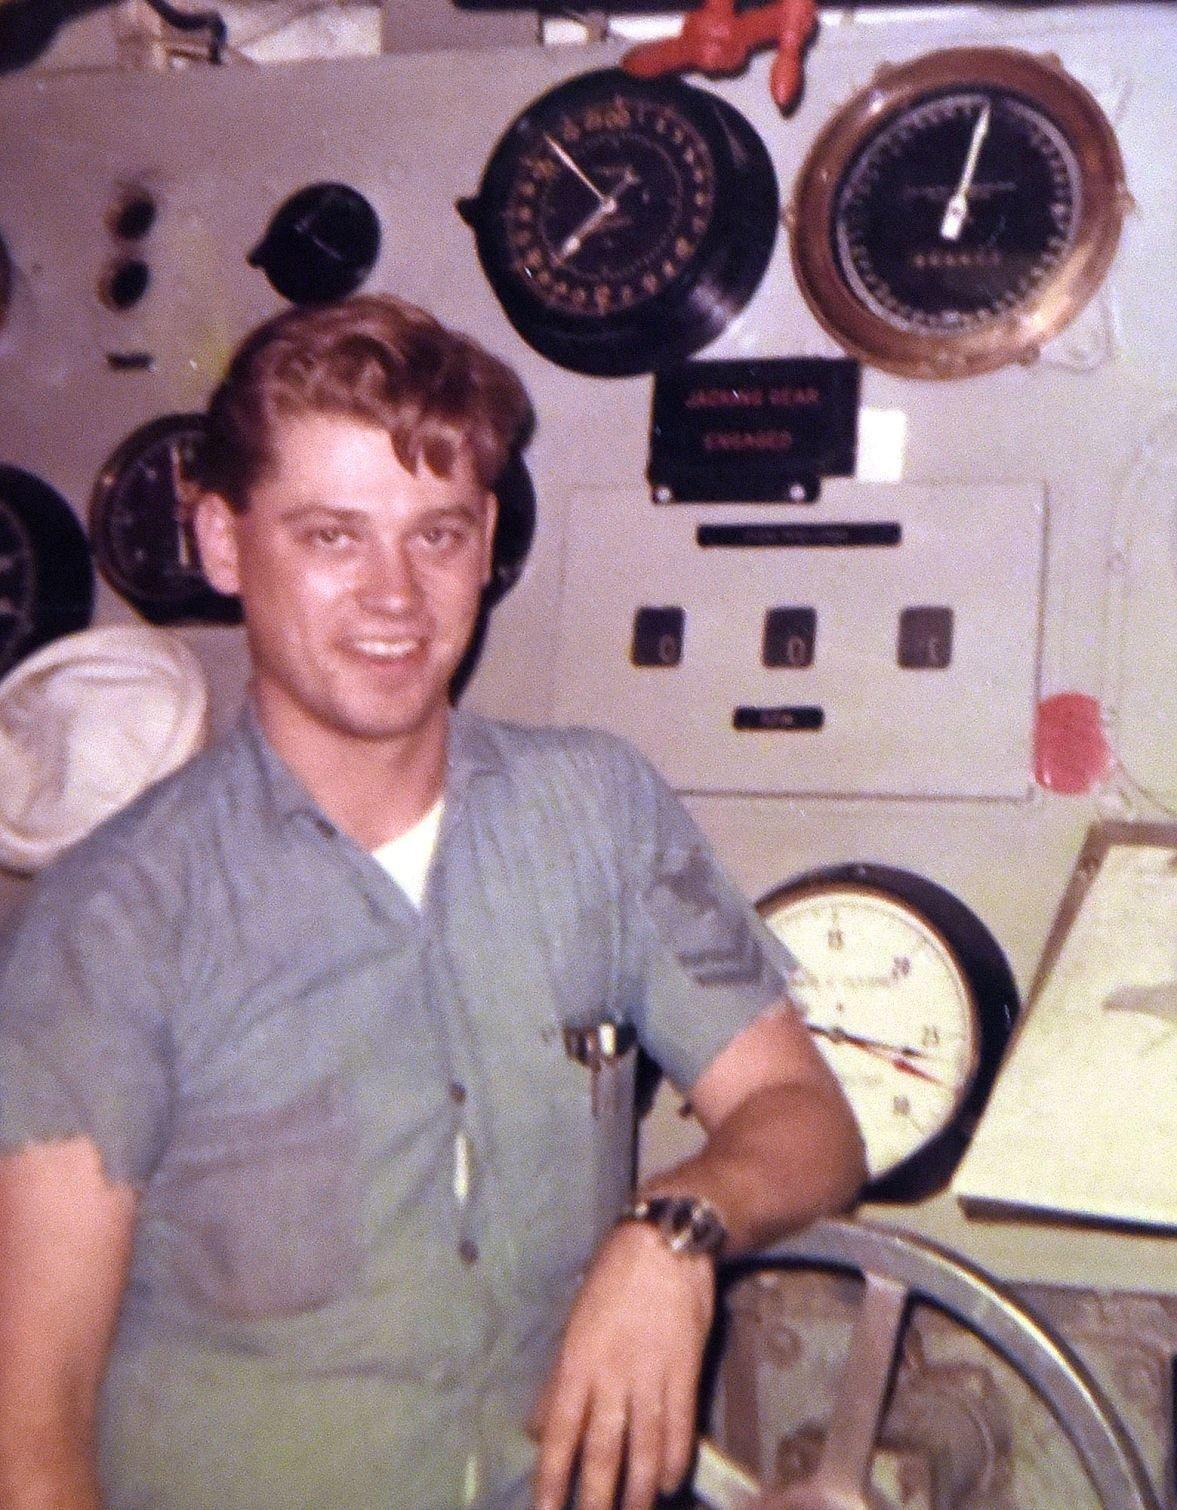 Aircraft Carrier Engine Room: Manchester Sailor's Vietnam War Story: Surviving Destroyer